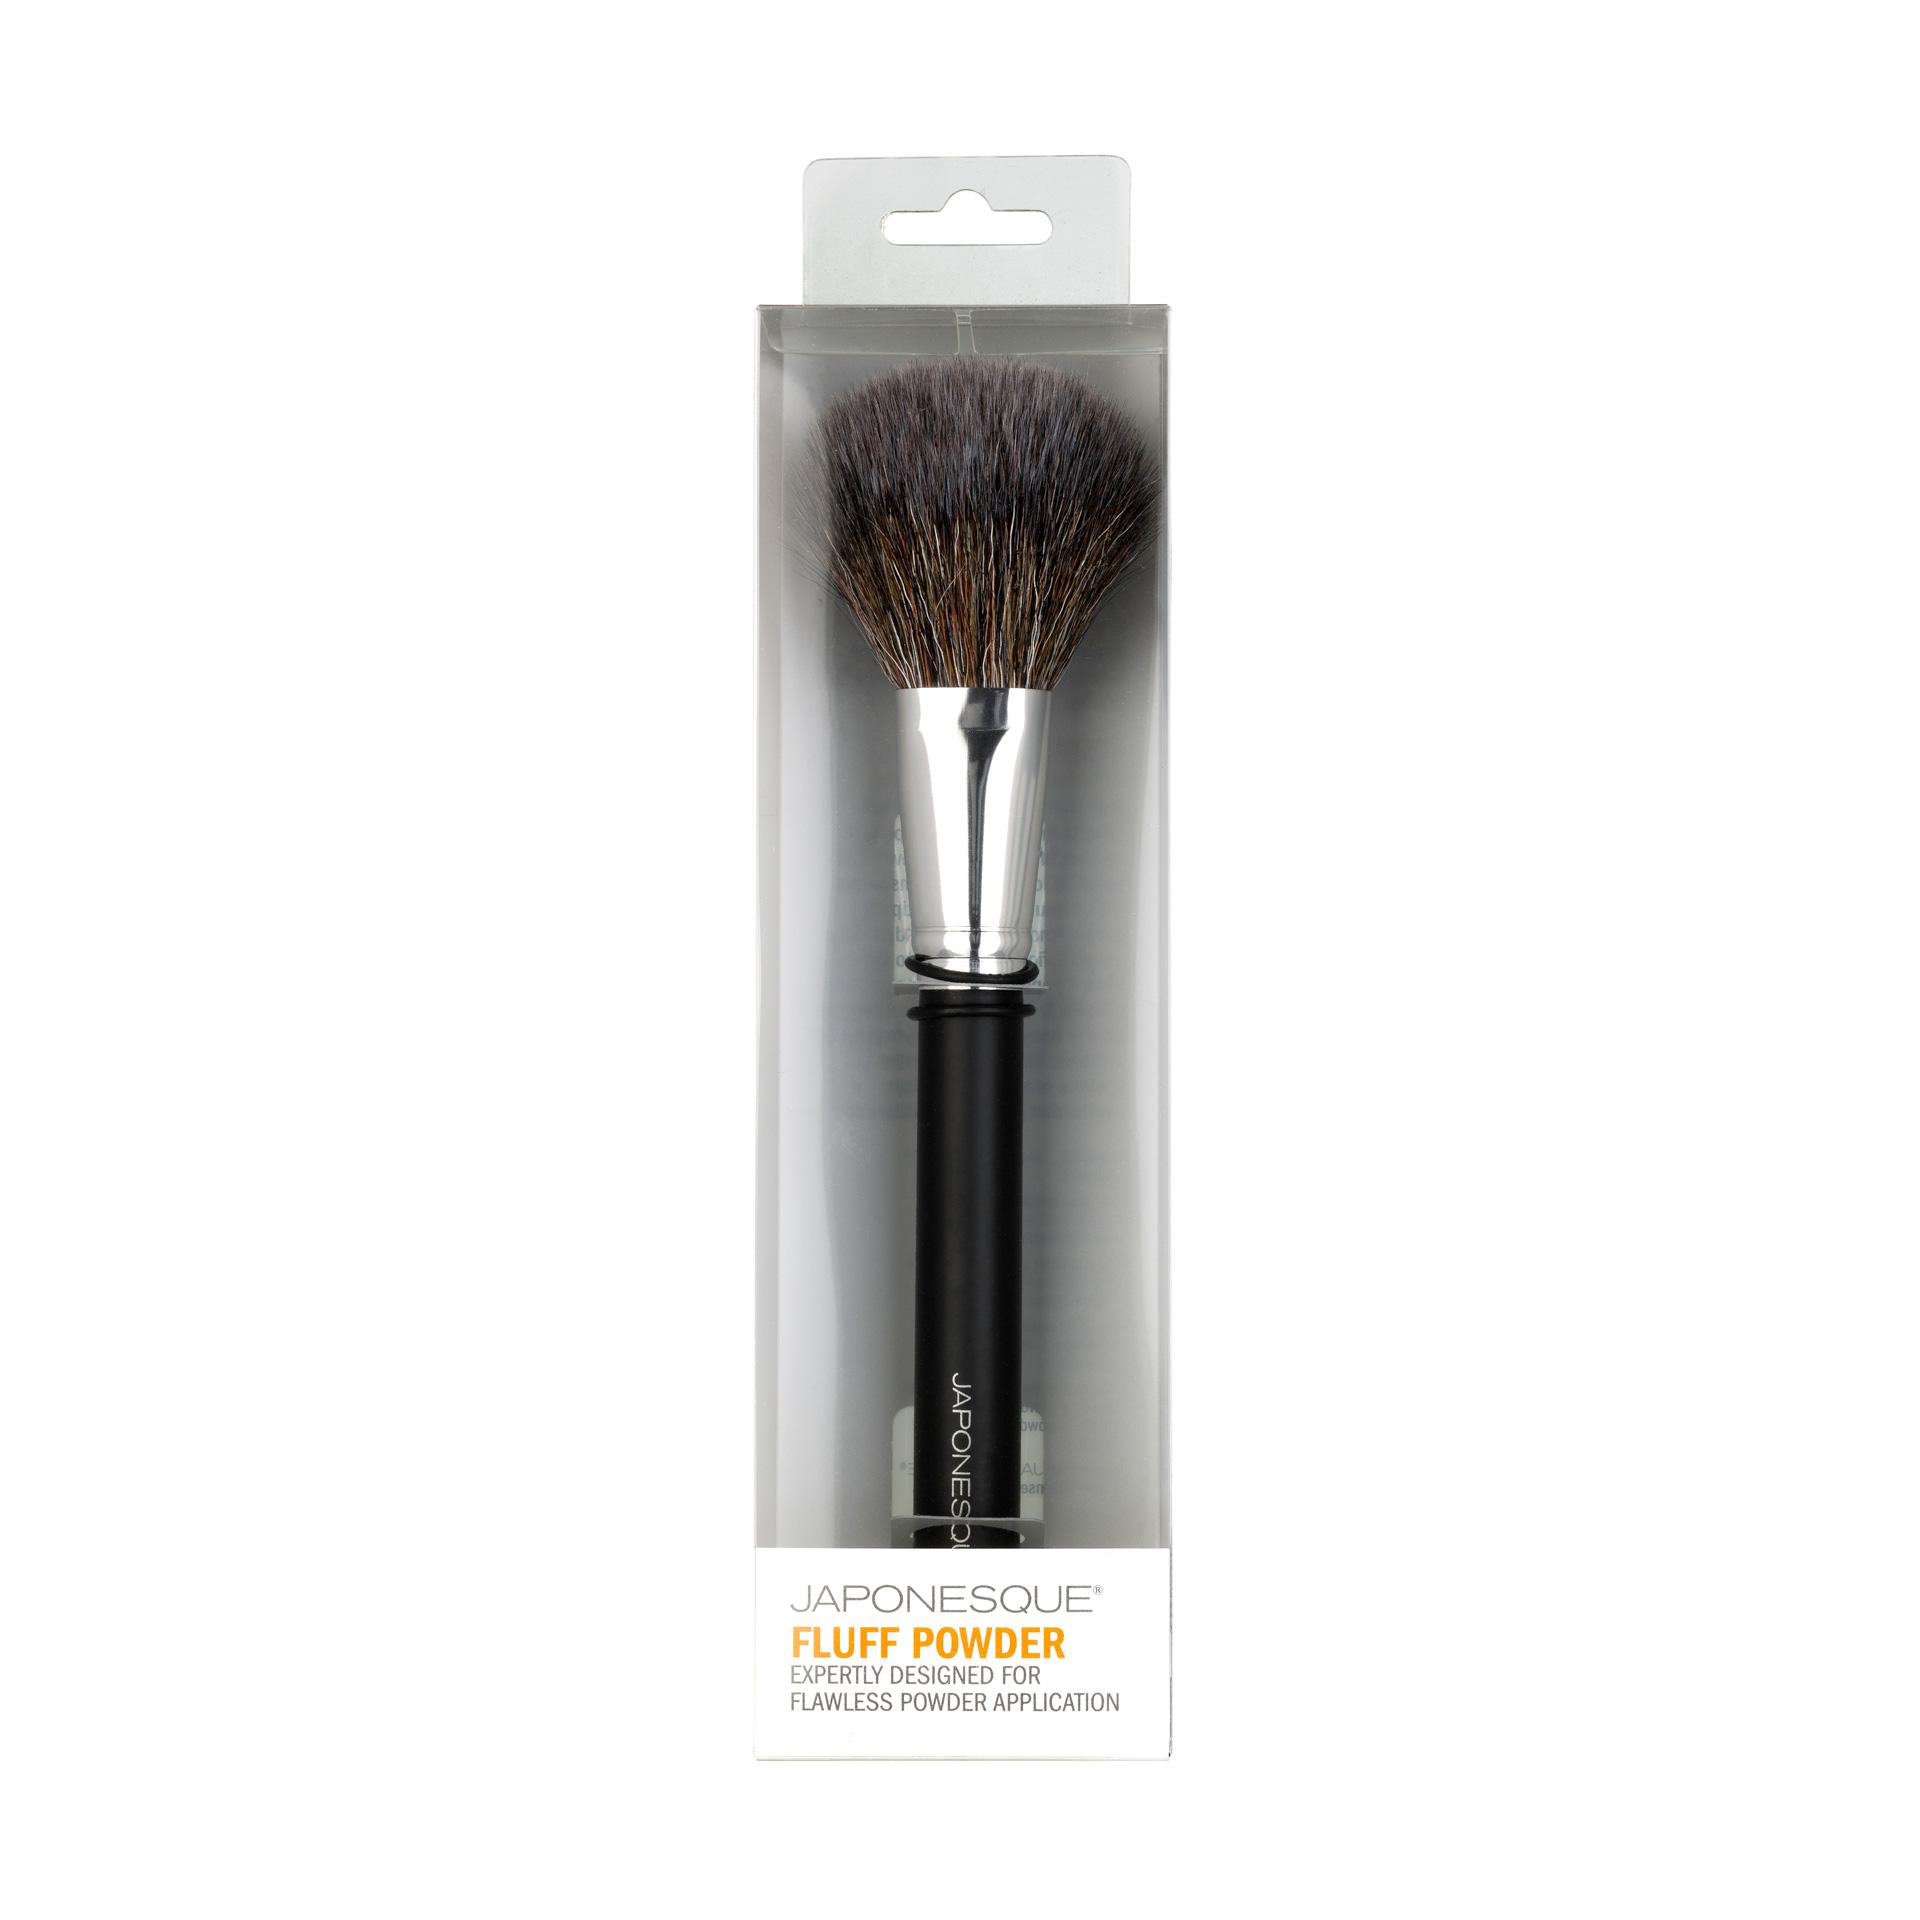 Slanted Powder Brush by japonesque #5